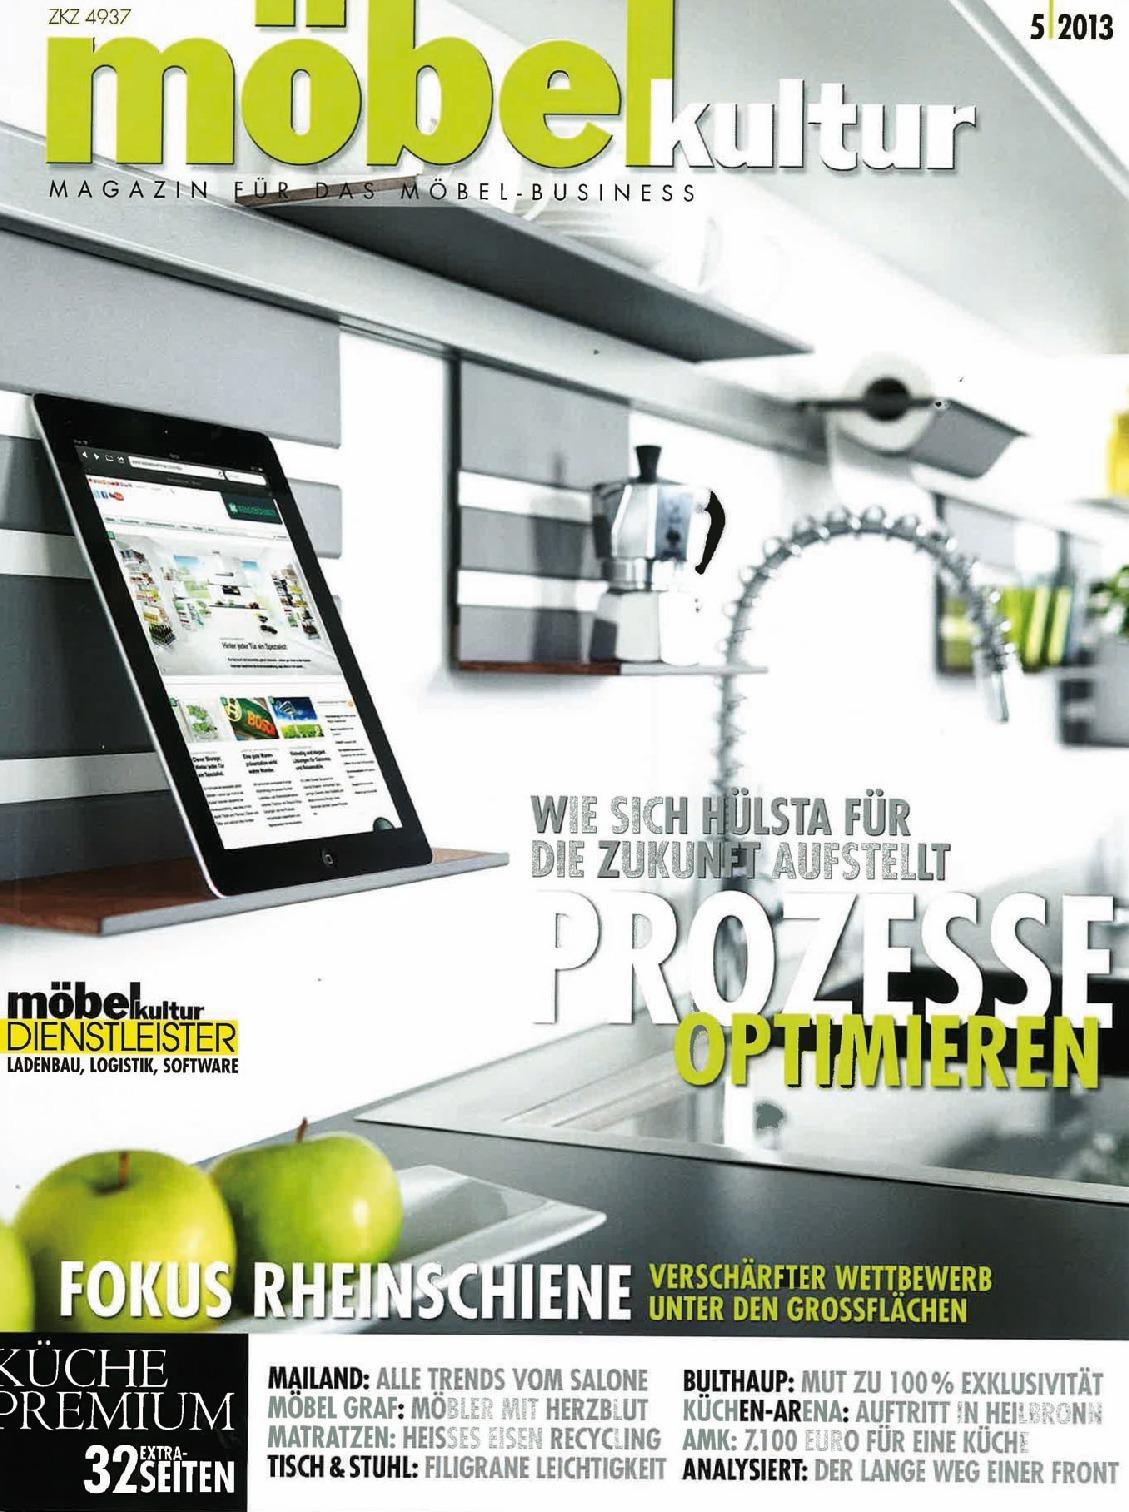 Germany_-_Mobel_-_Kultur-_cover_-_may_2013_LR-0